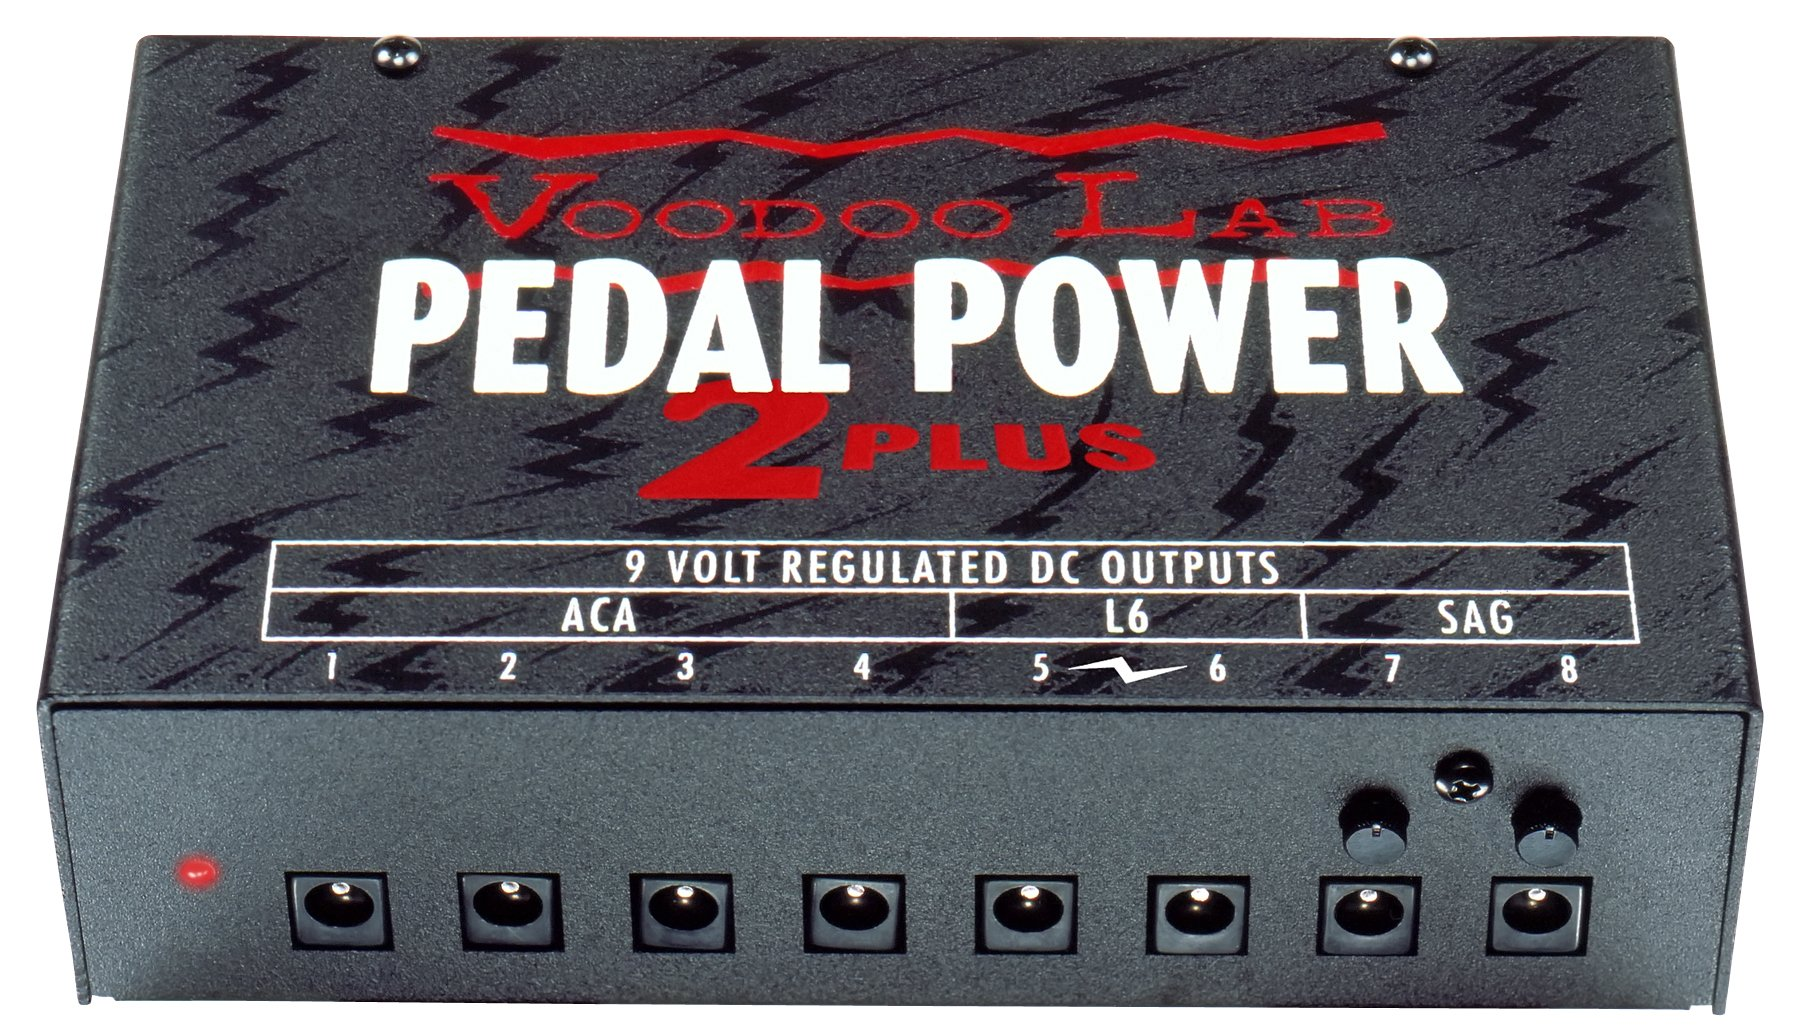 Alimentador Voodoo Lab Pedal Power 2